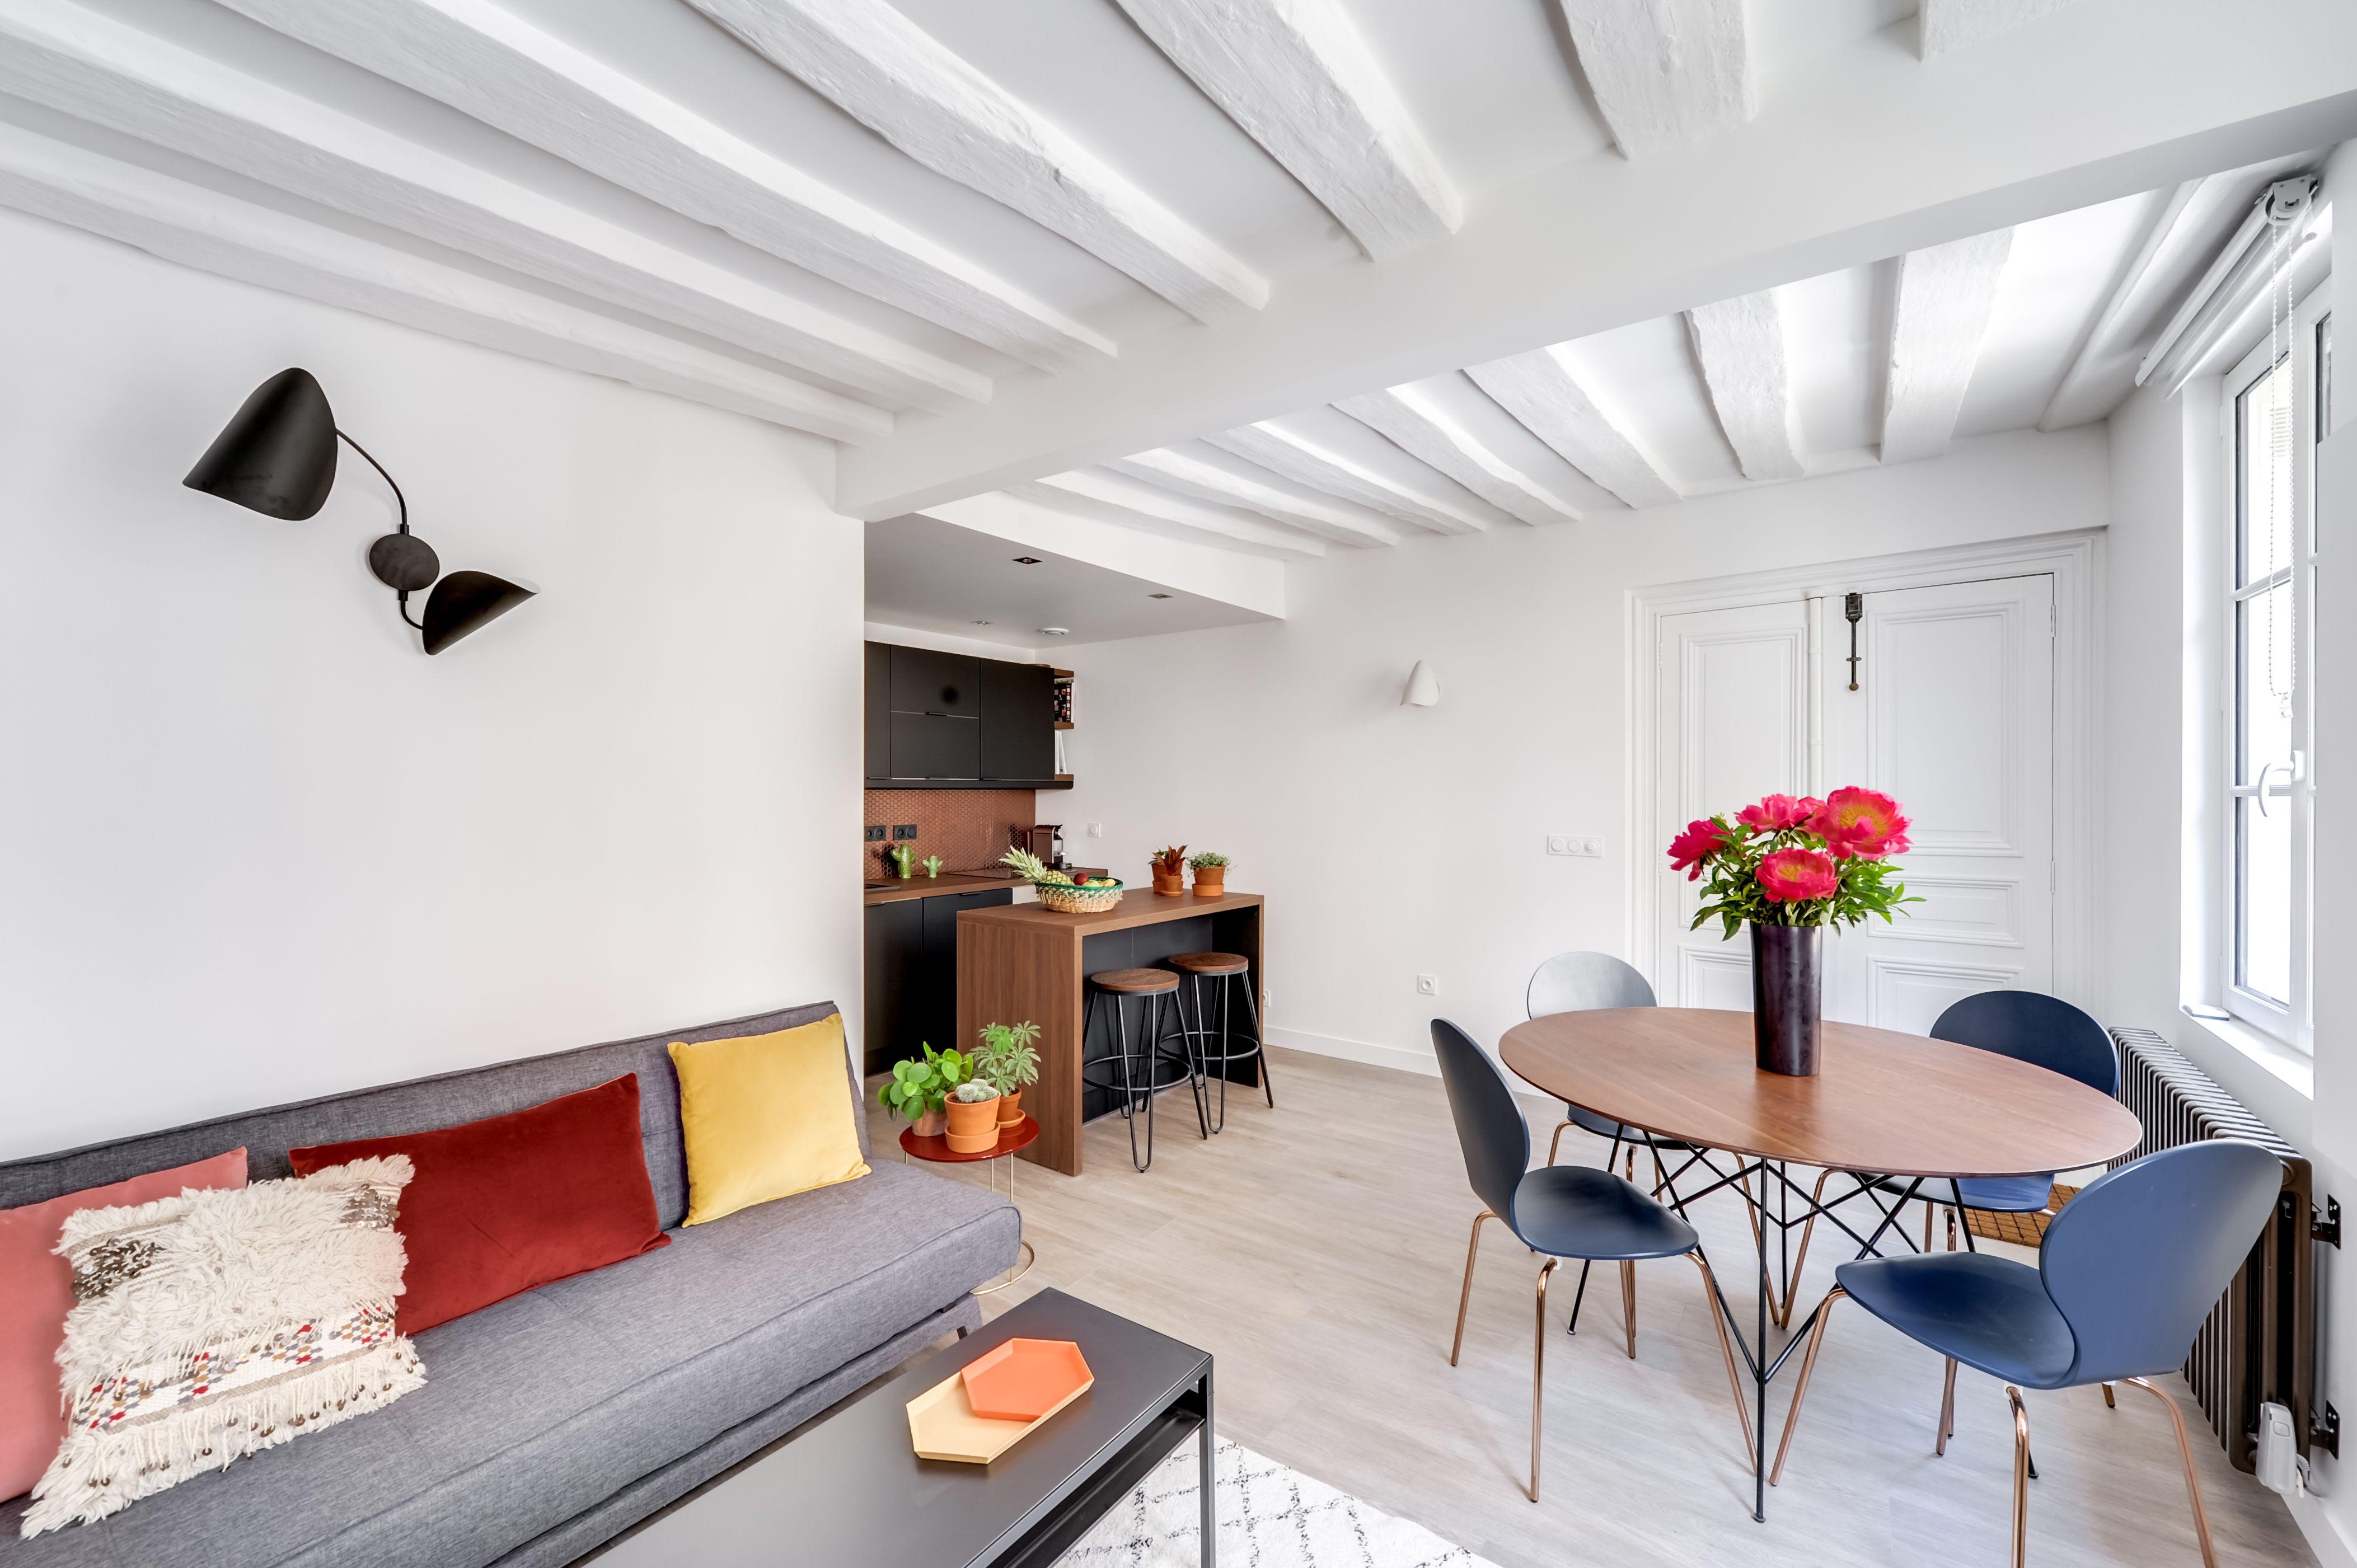 salon salle manger rnovation complte dun appartement de 40 m2 proche